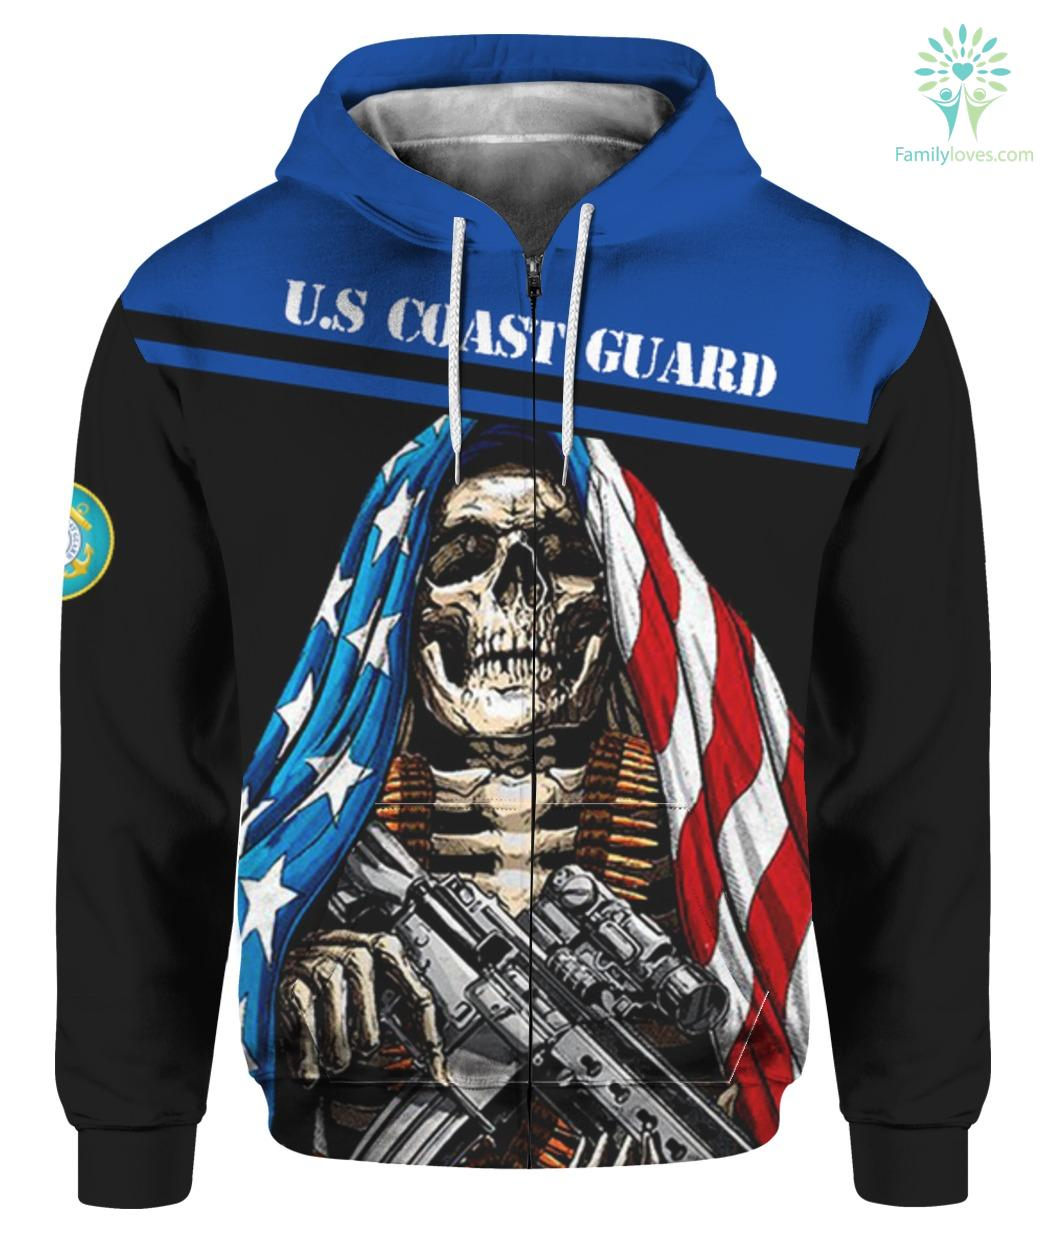 U.S COAST GUARD CLOTHING- 3D PRINTED SKULL WITH FLAG Familyloves.com